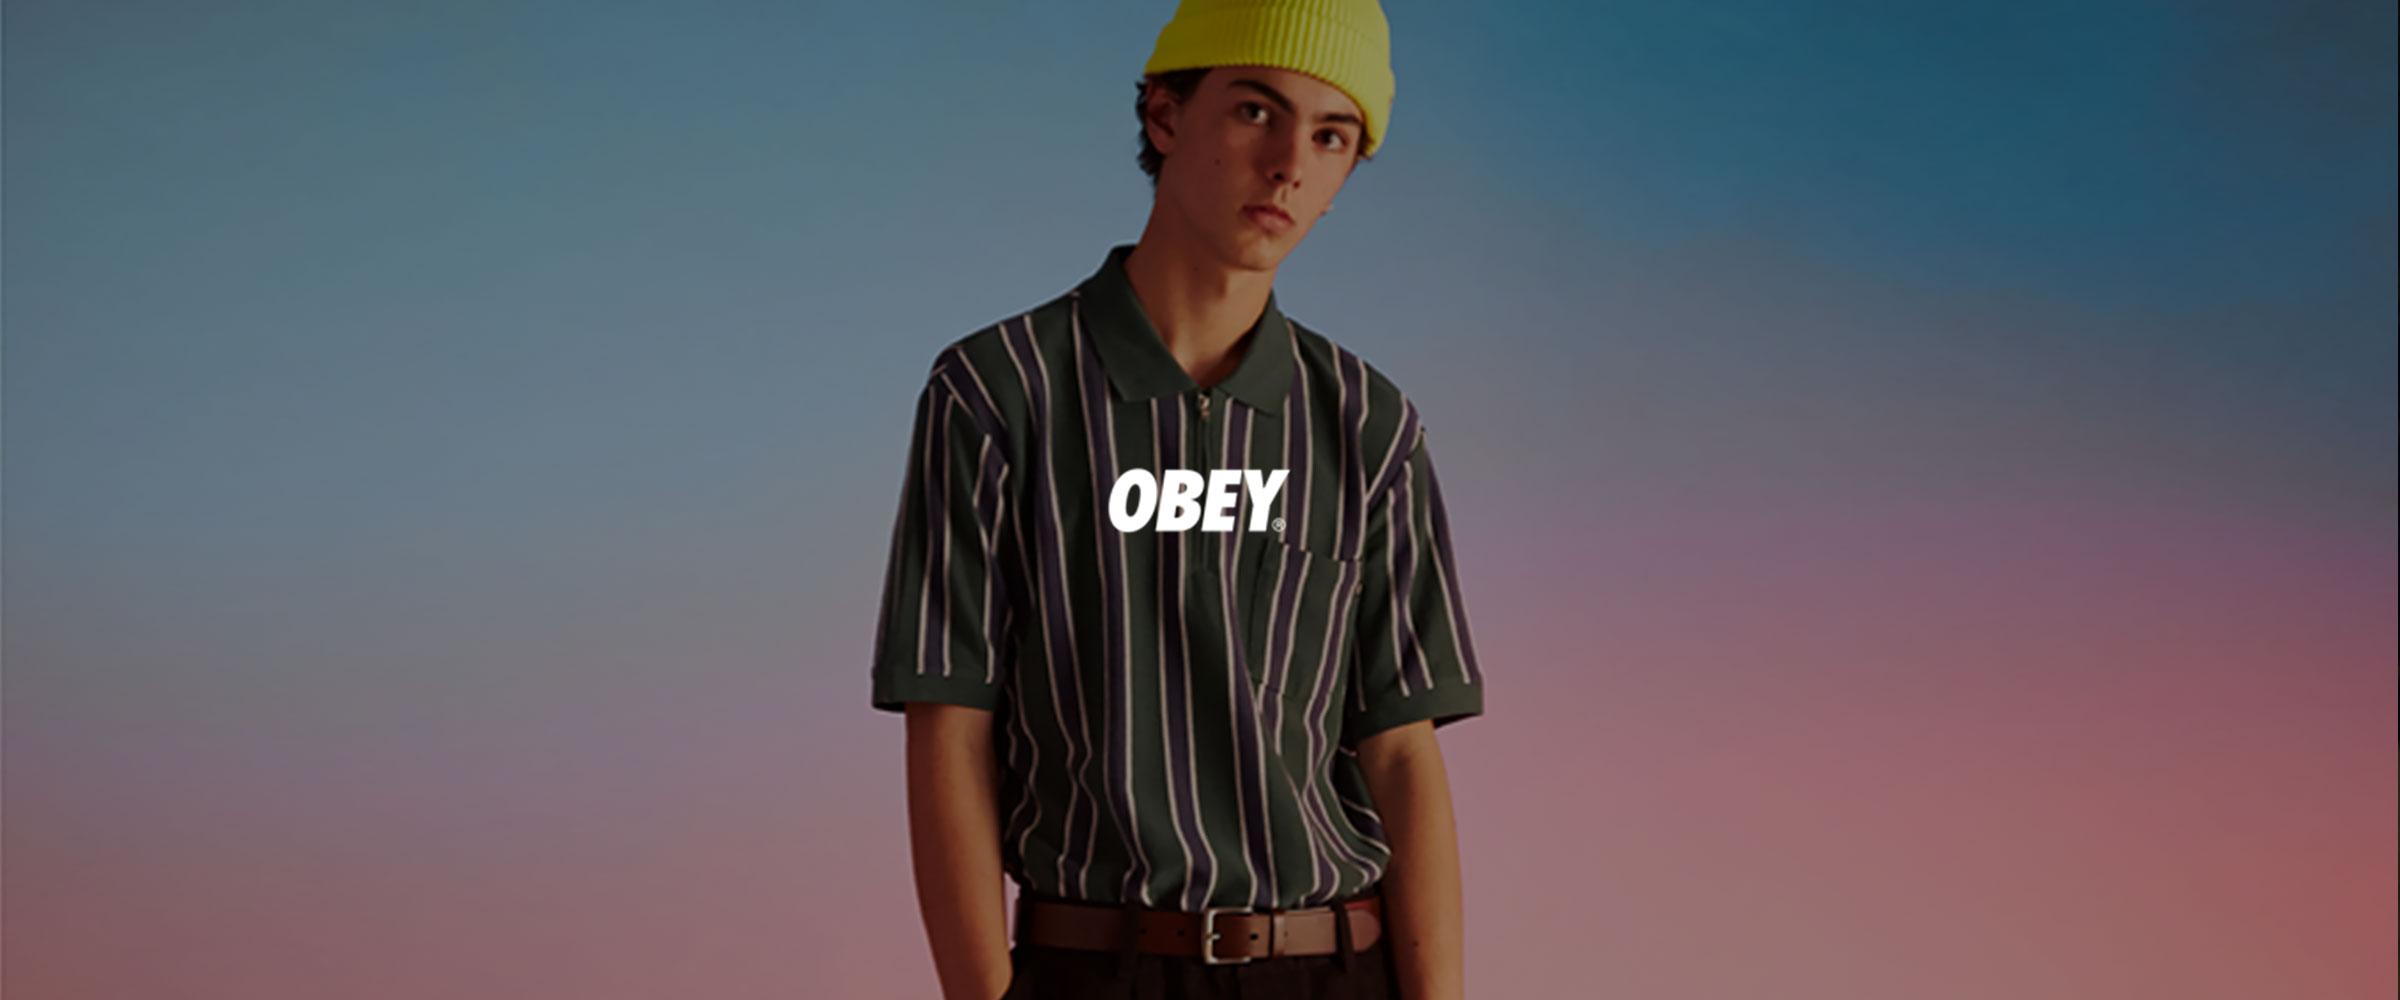 obey.jpg